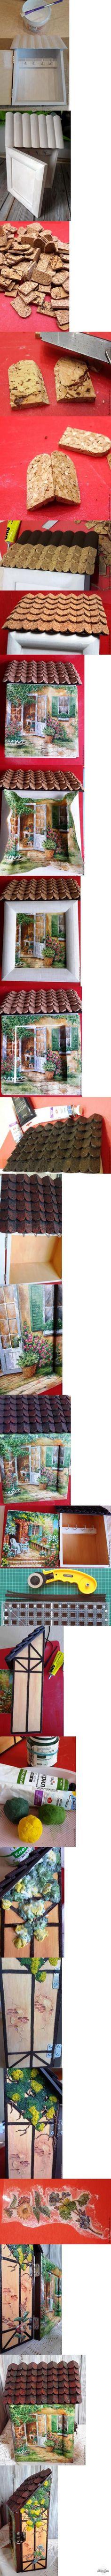 Декупаж - Сайт любителей декупажа - DCPG.RU | Ключница в стиле фахверк Click on photo to see more! Нажмите на фото чтобы увидеть больше! decoupage art craft handmade home decor DIY do it yourself tutorial Materials and techniques: napkin varnish acrylic paint etc.